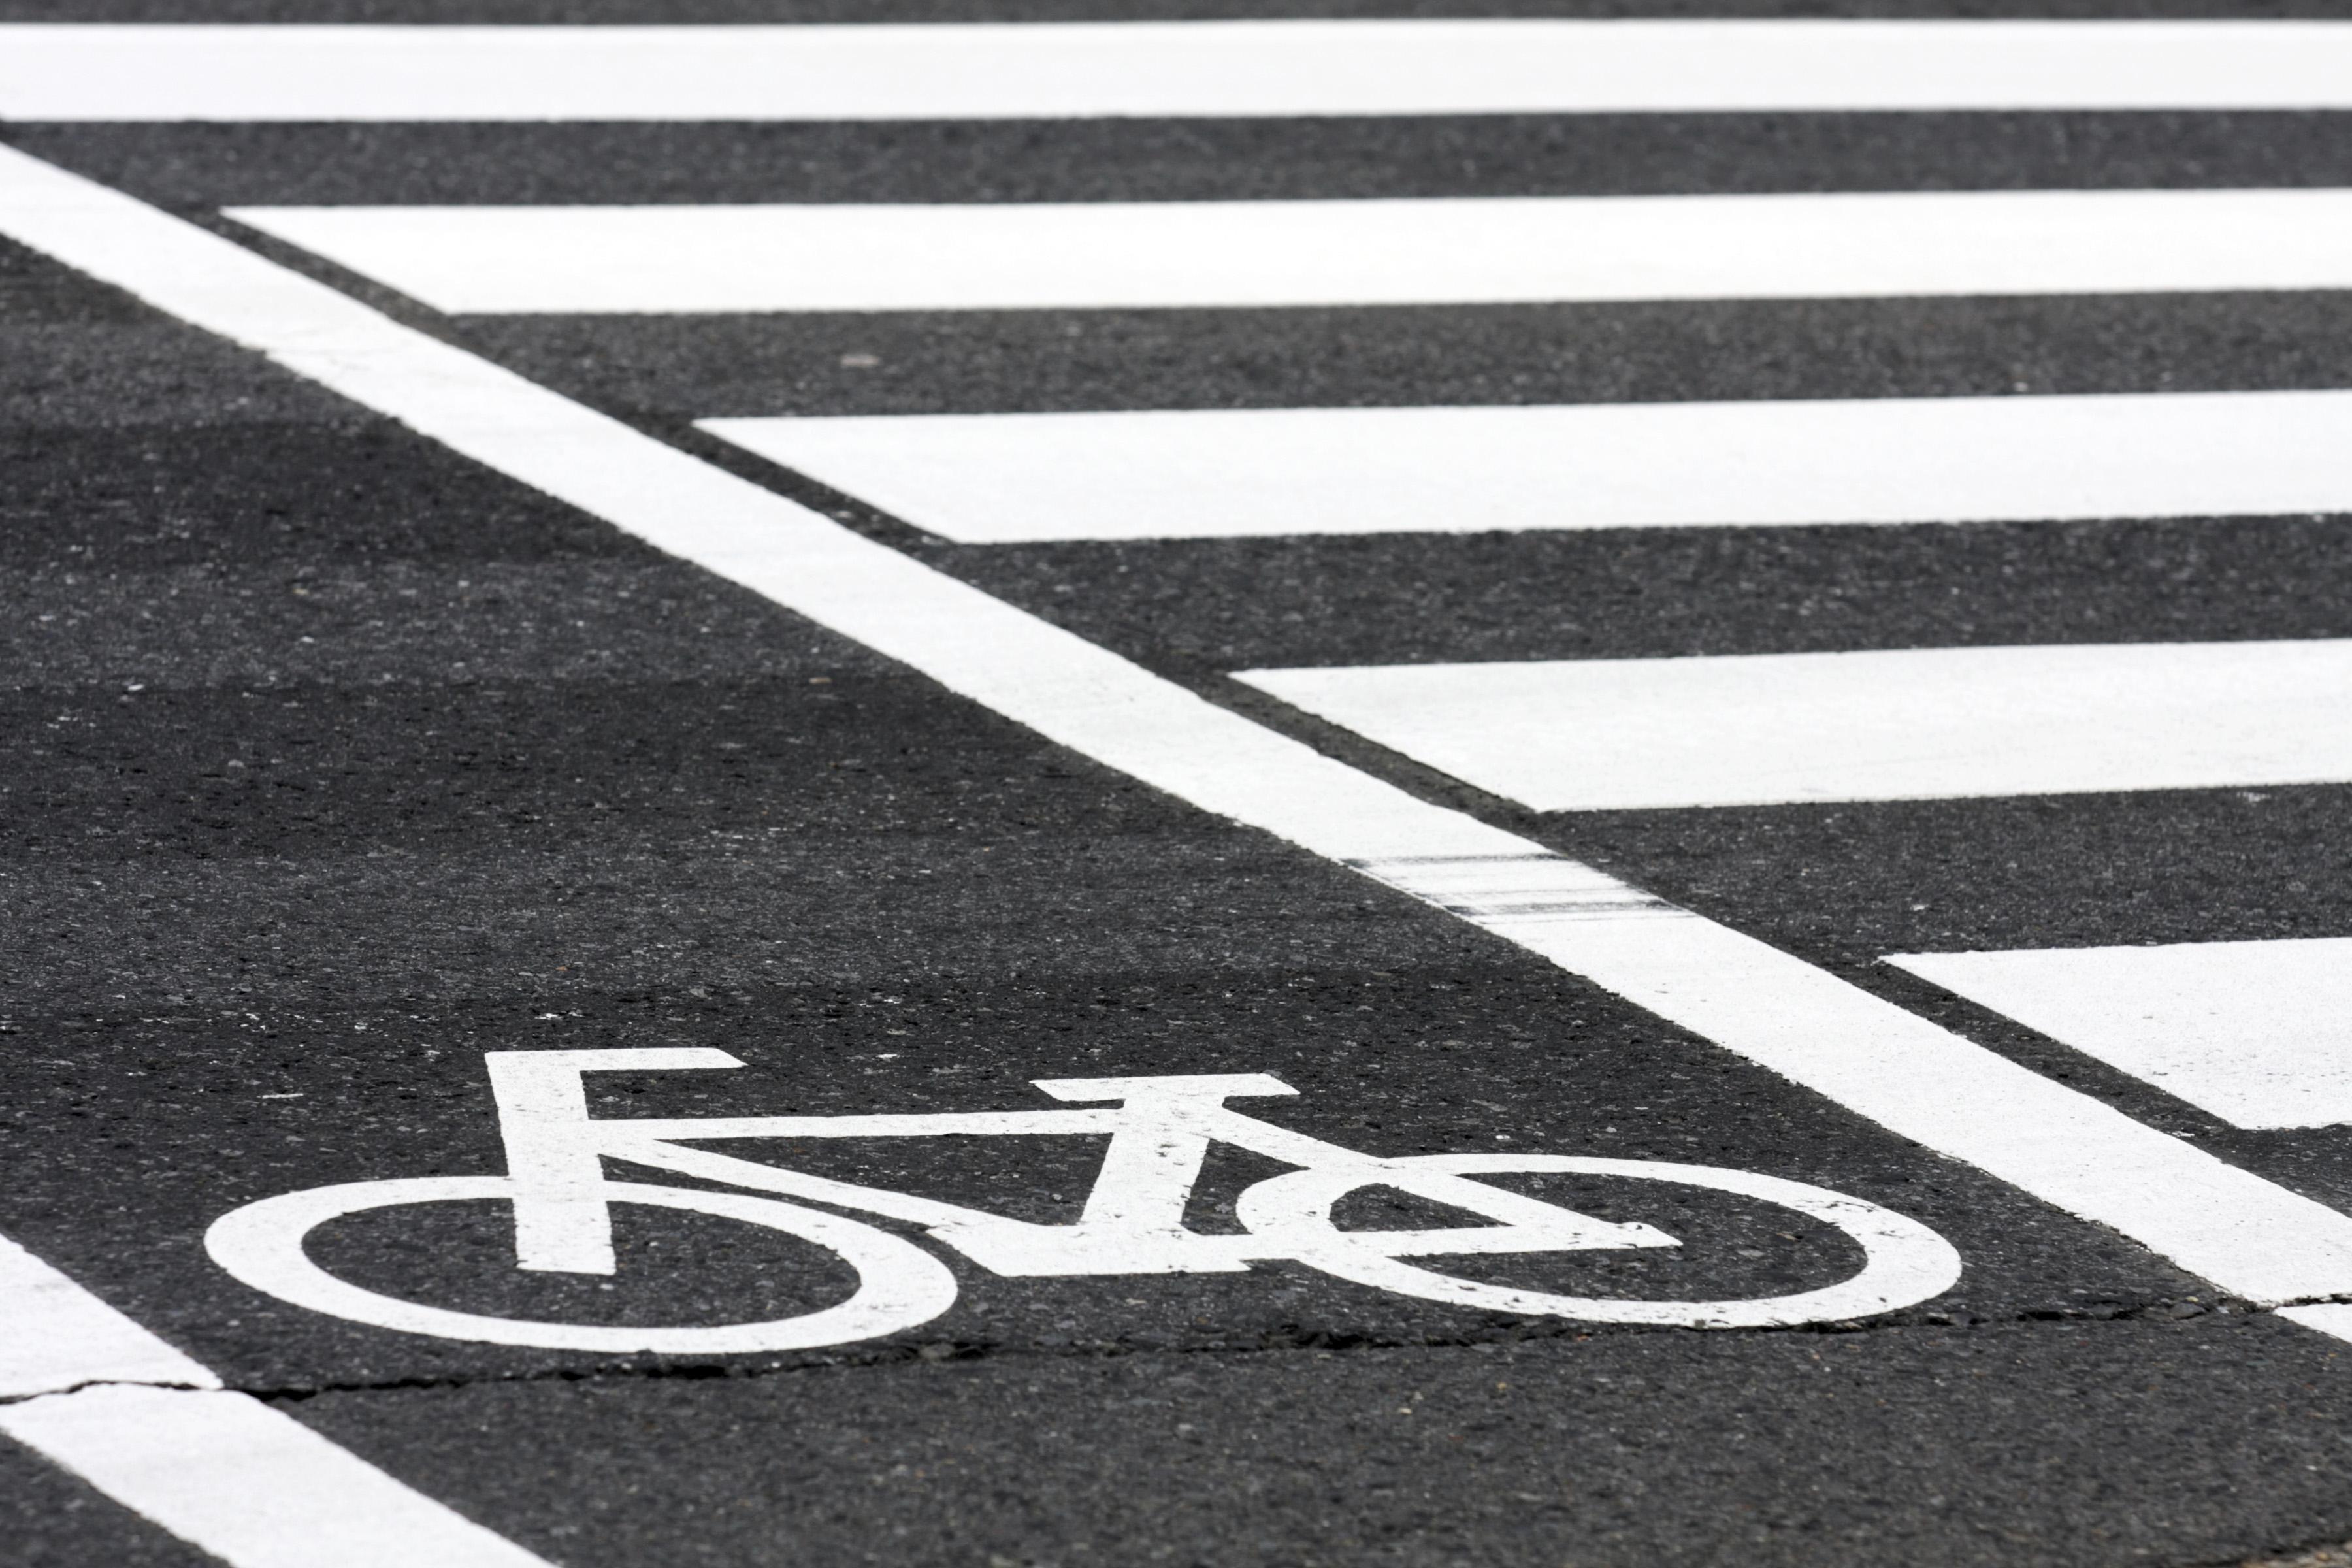 Urban (im)mobility